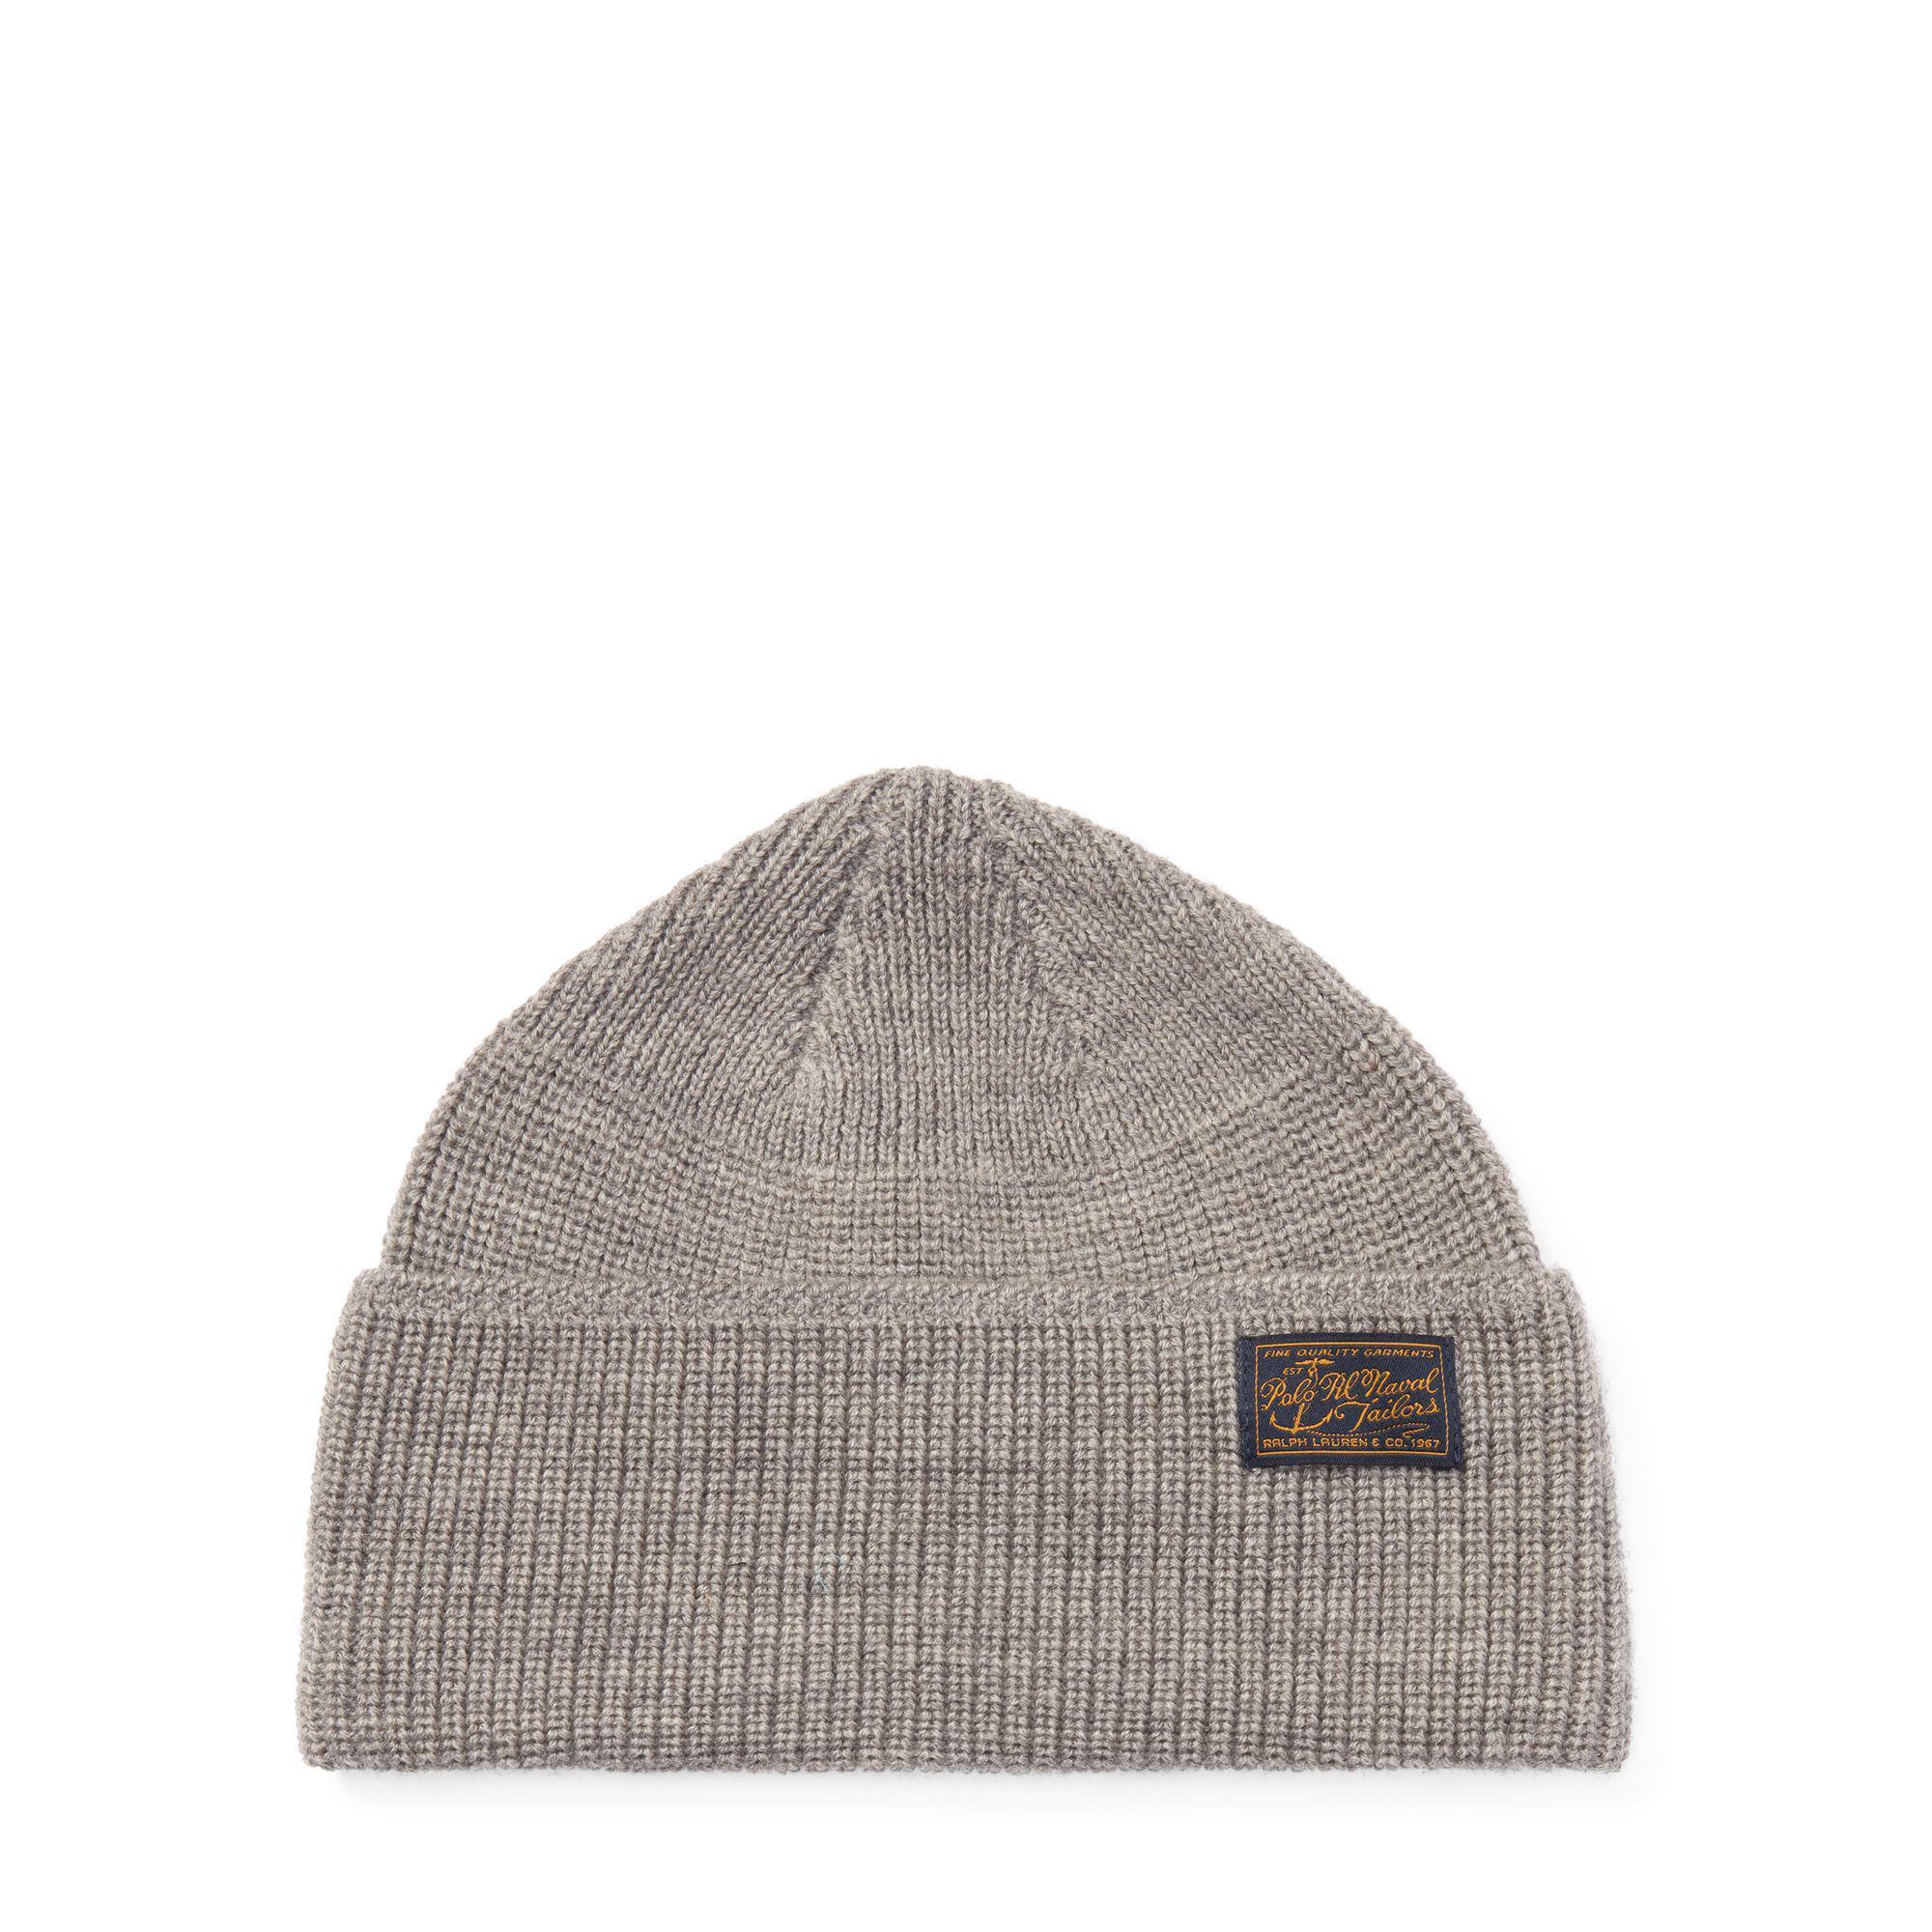 839423d6e0e Lyst - Polo Ralph Lauren Naval-brim Knit Hat in Gray for Men